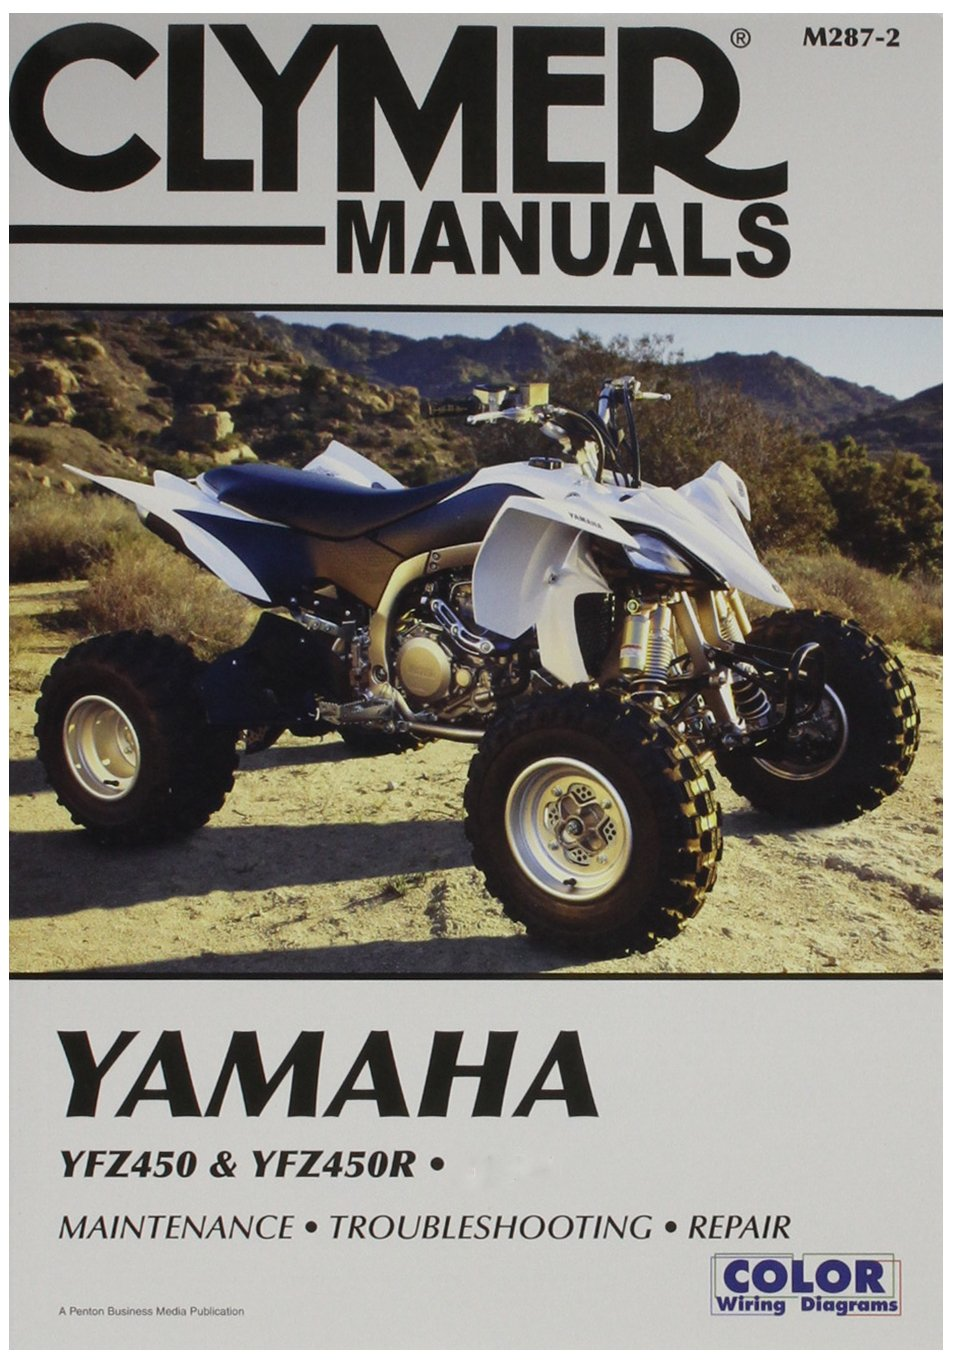 [DIAGRAM_3NM]  9DB049 Yamaha Yfz 450 2004 Digital Service Repair Manual | Wiring Library | 2000 Yfz 450 Wiring Diagram Free Download |  | Wiring Library